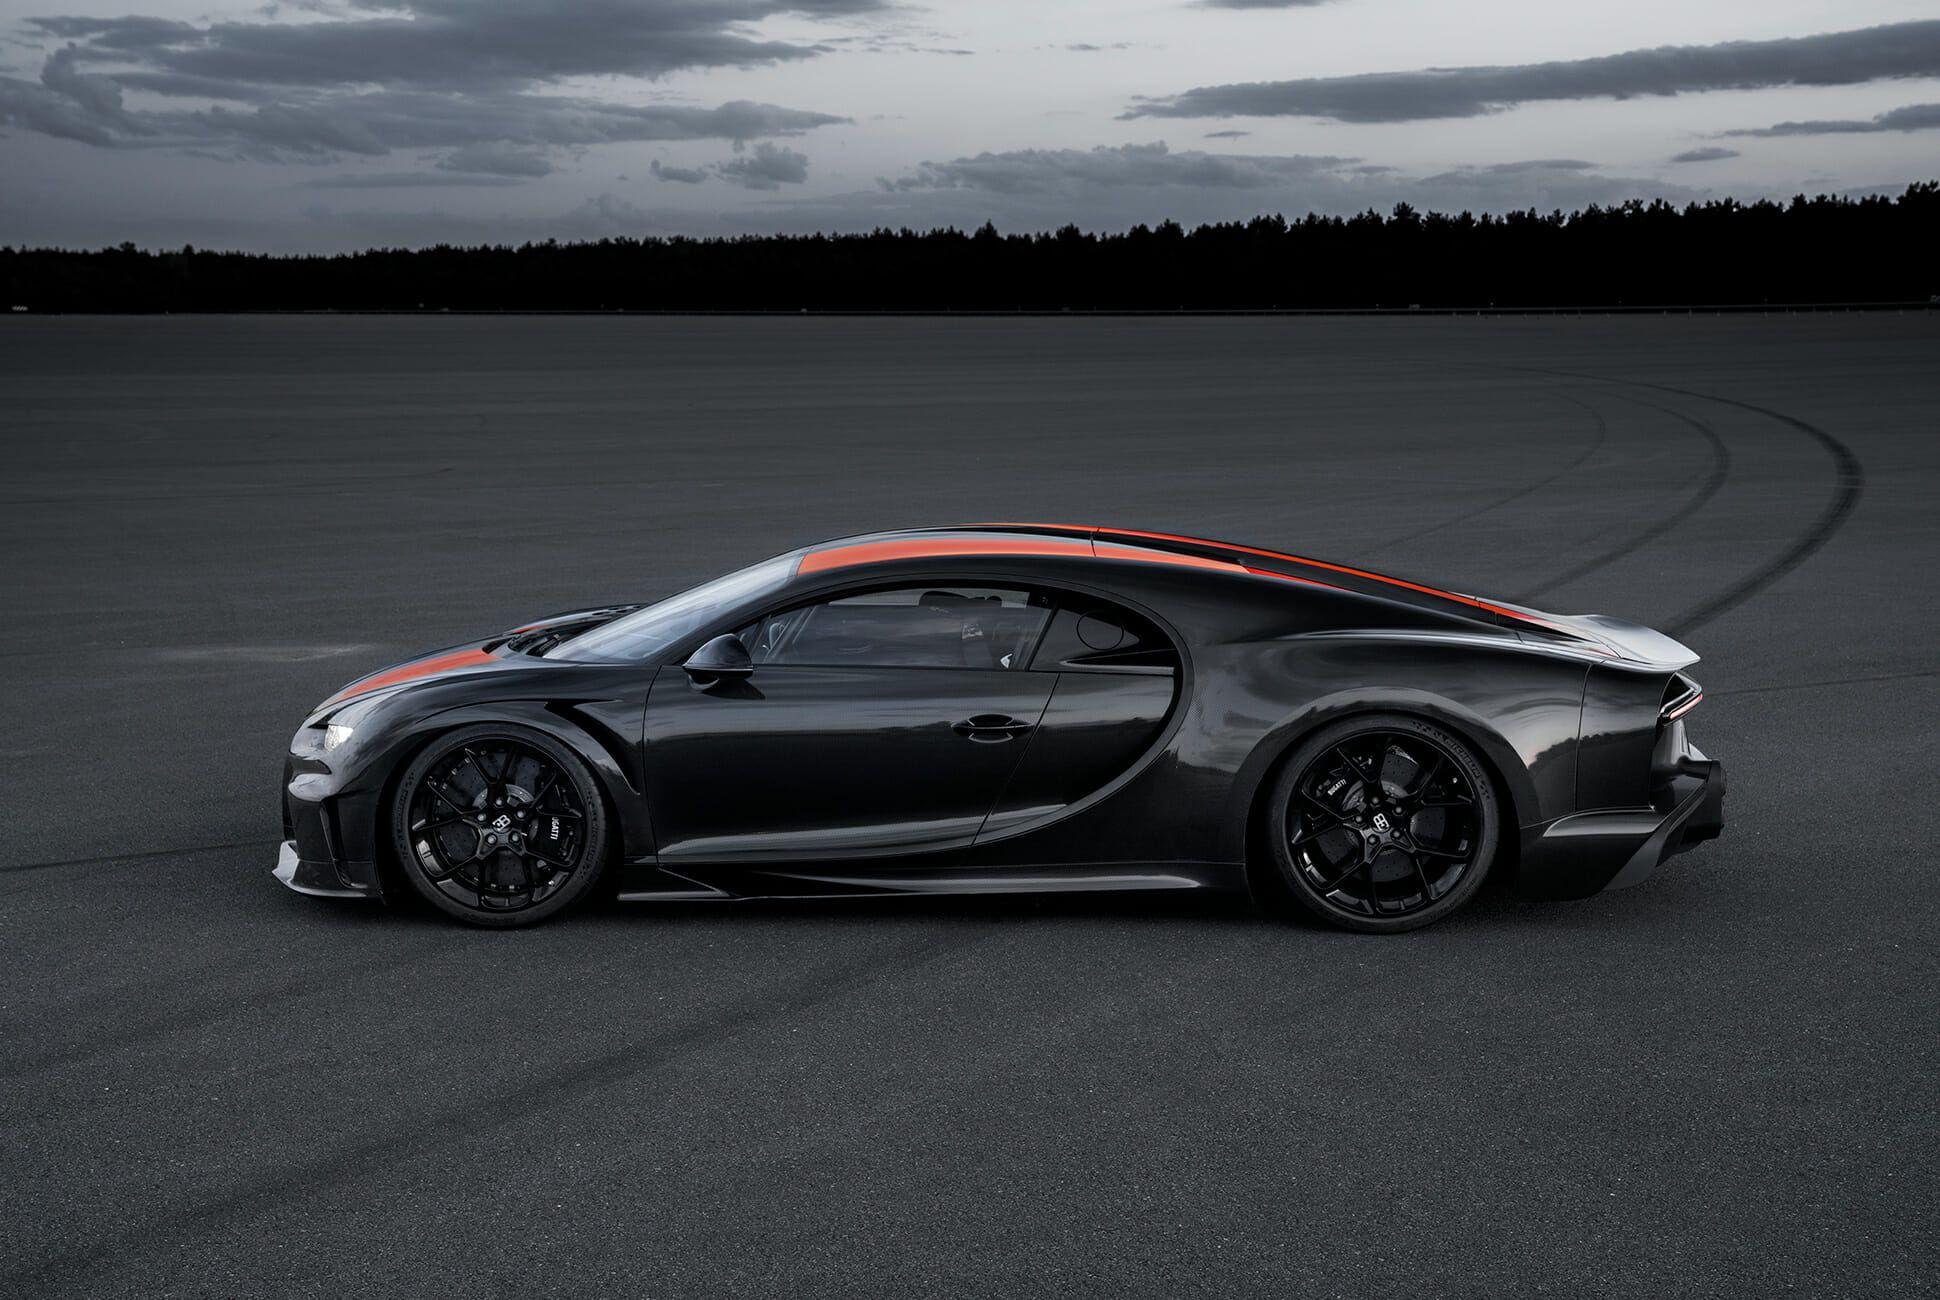 Bugatti-Chiron-gear-patrol-slide-03